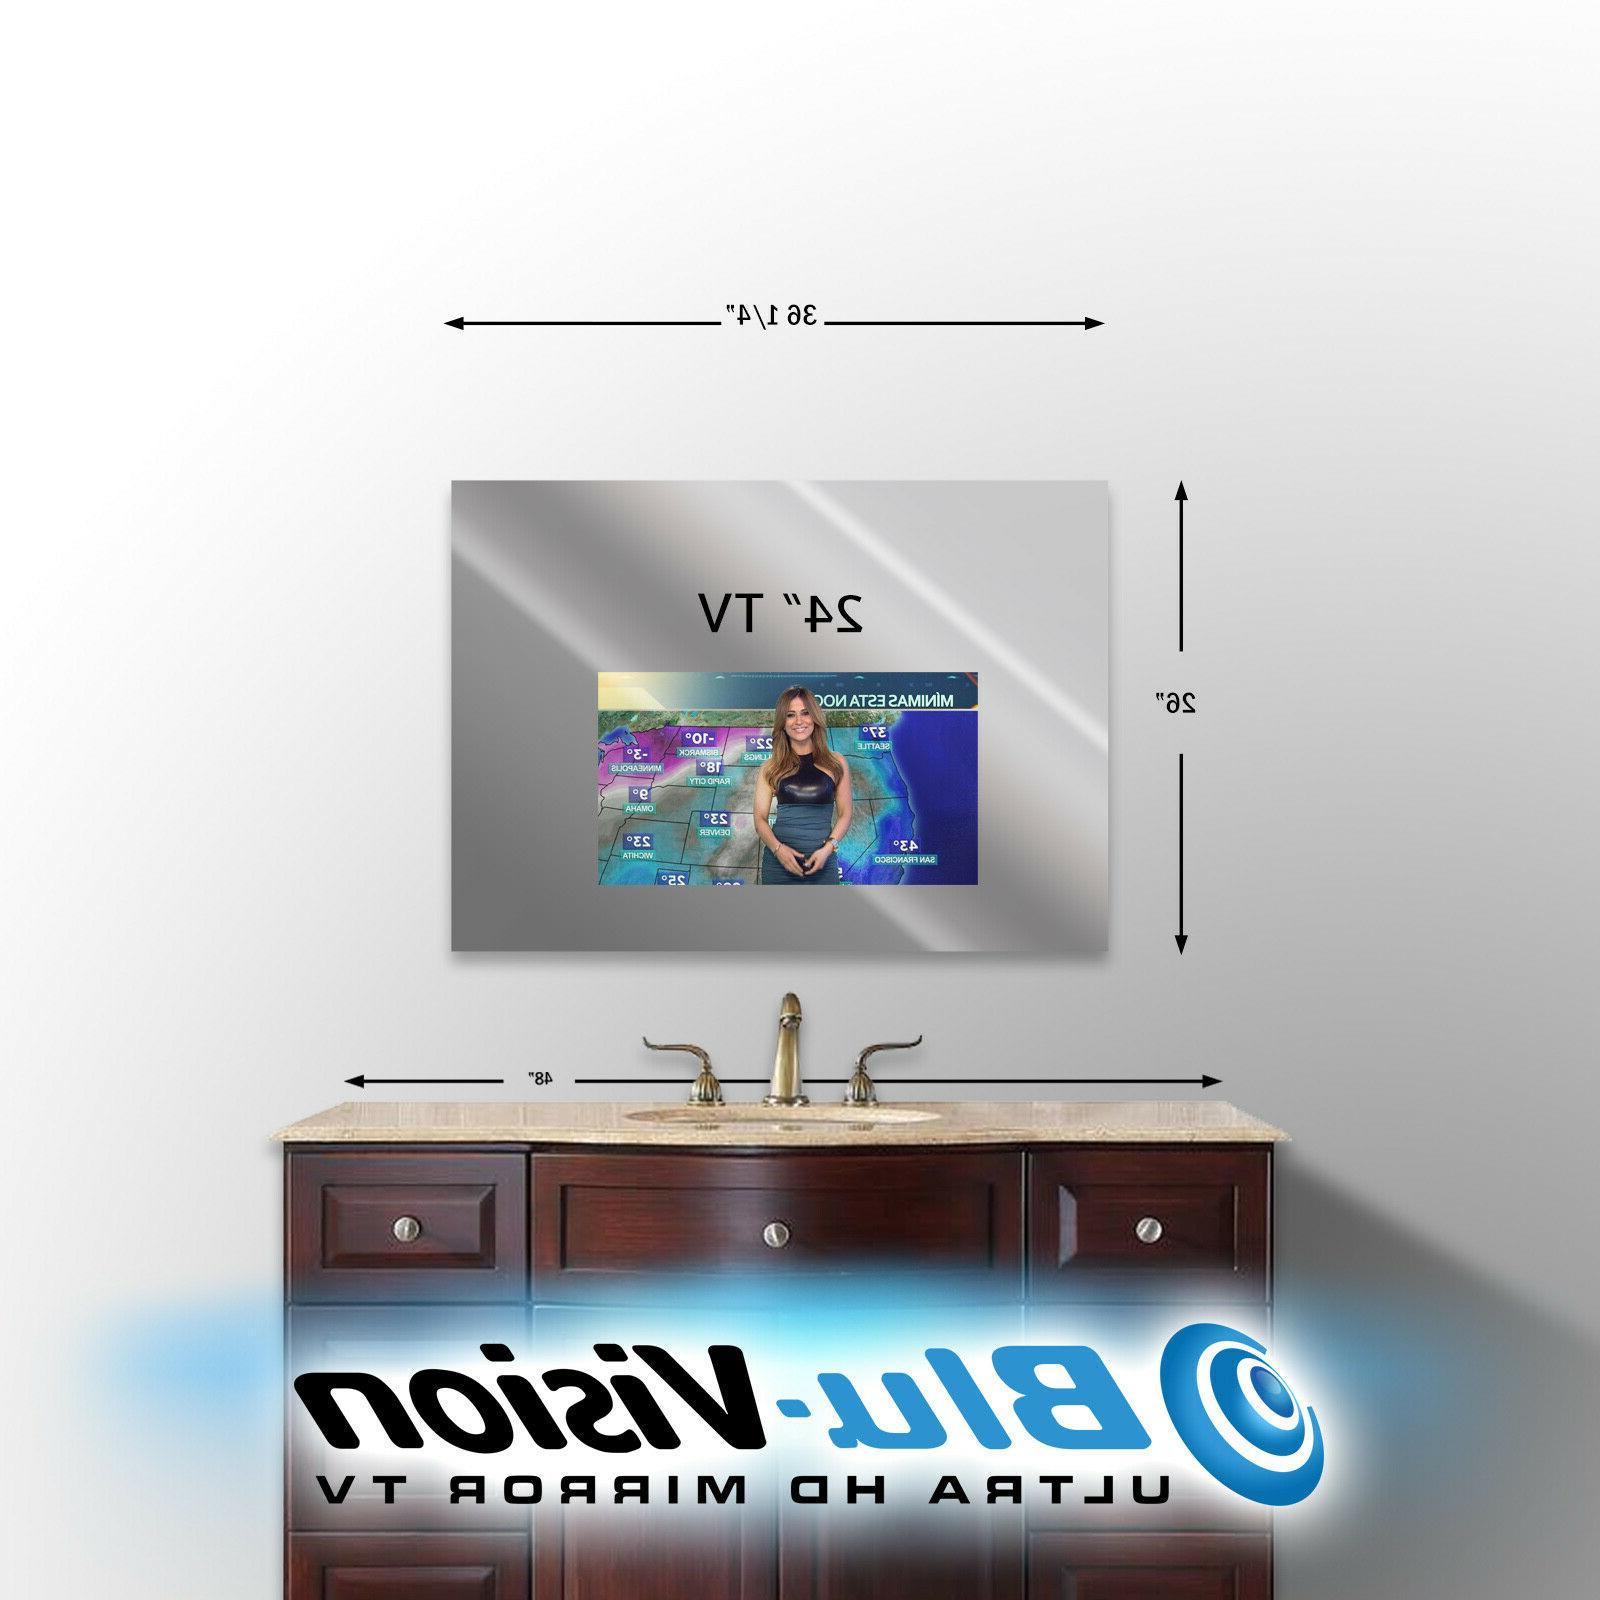 "VANITY MIRROR TV LG 24"" CLASS LED SMART HDTV 32""  W X 27"